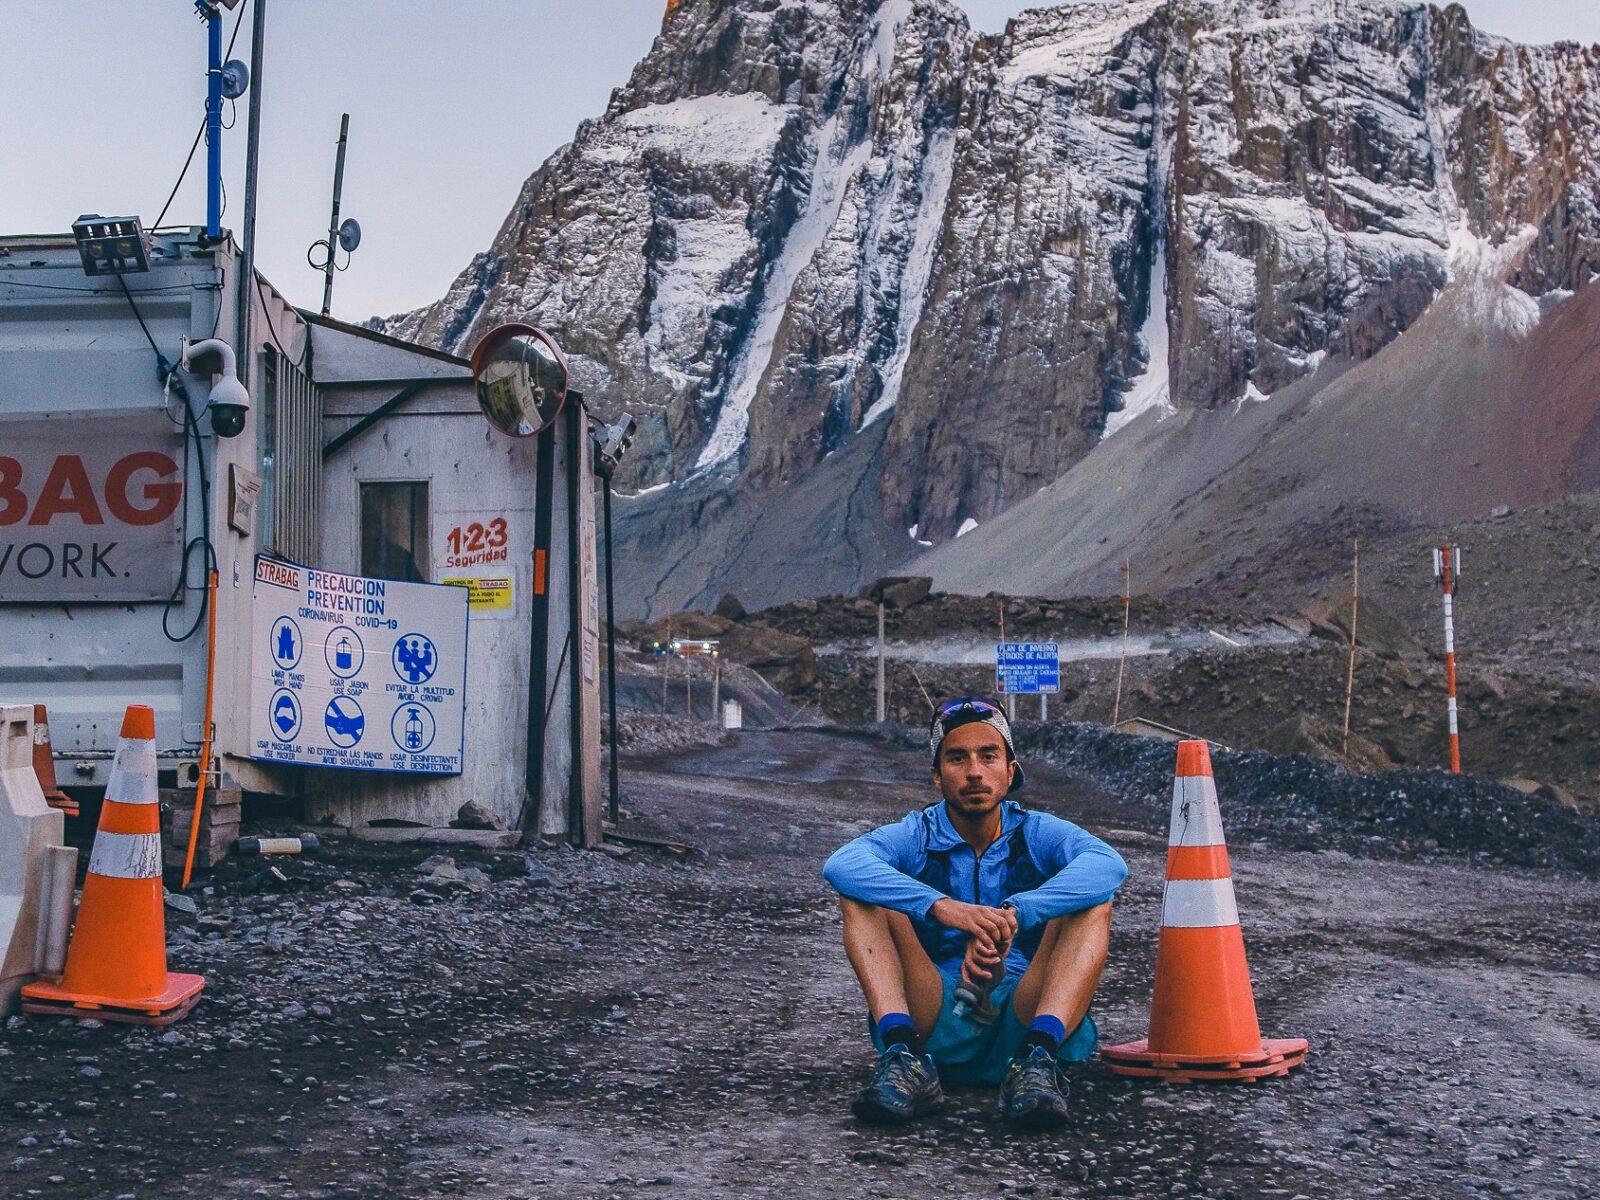 https://www.patagonia.jp/blog/wp-content/uploads/2021/09/manns-r-0112-cc-web-2250x1266-1.jpg